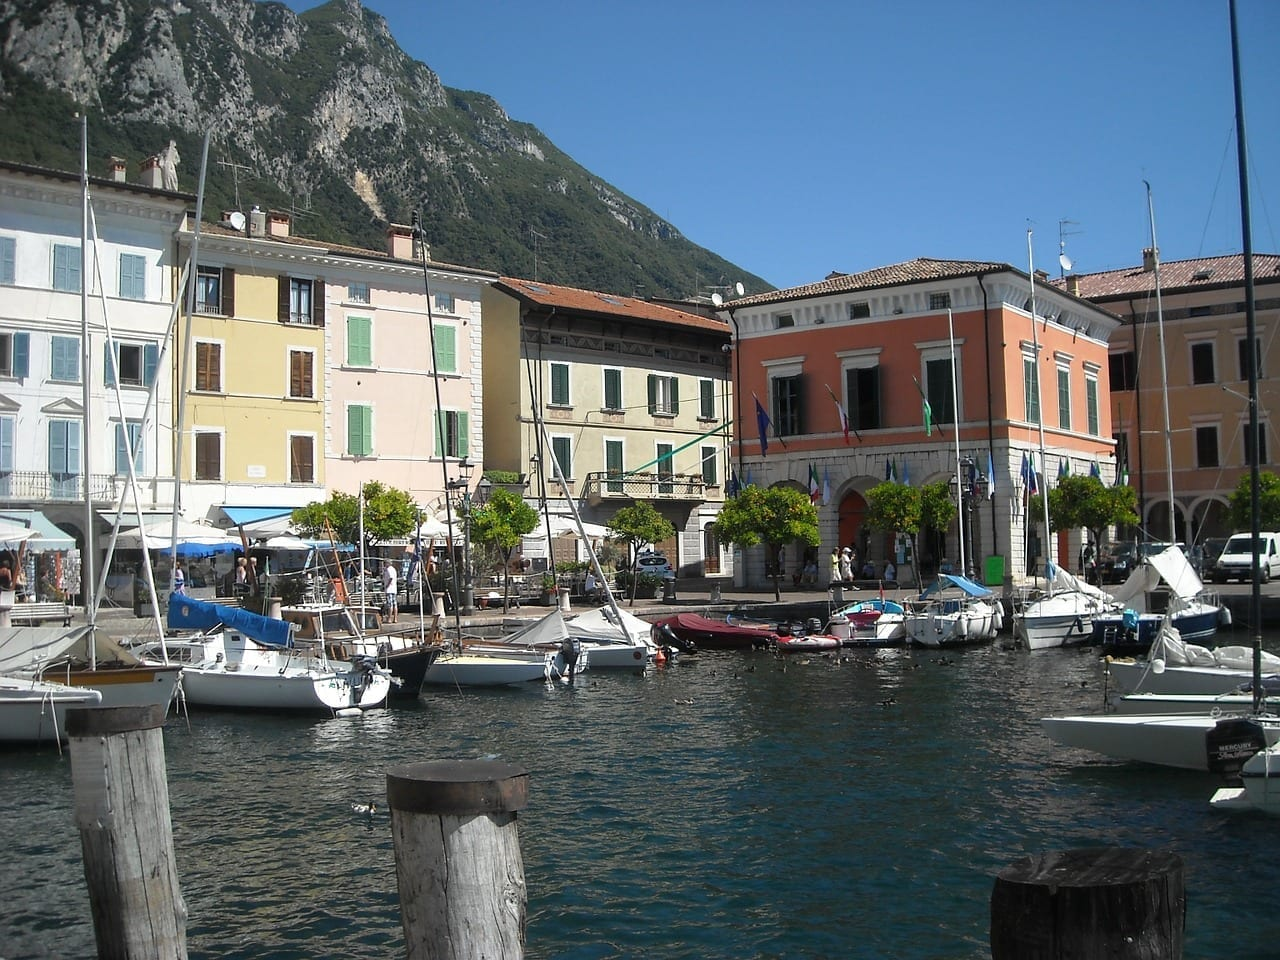 Garda Barcos De Vela Riva Del Garda Italia